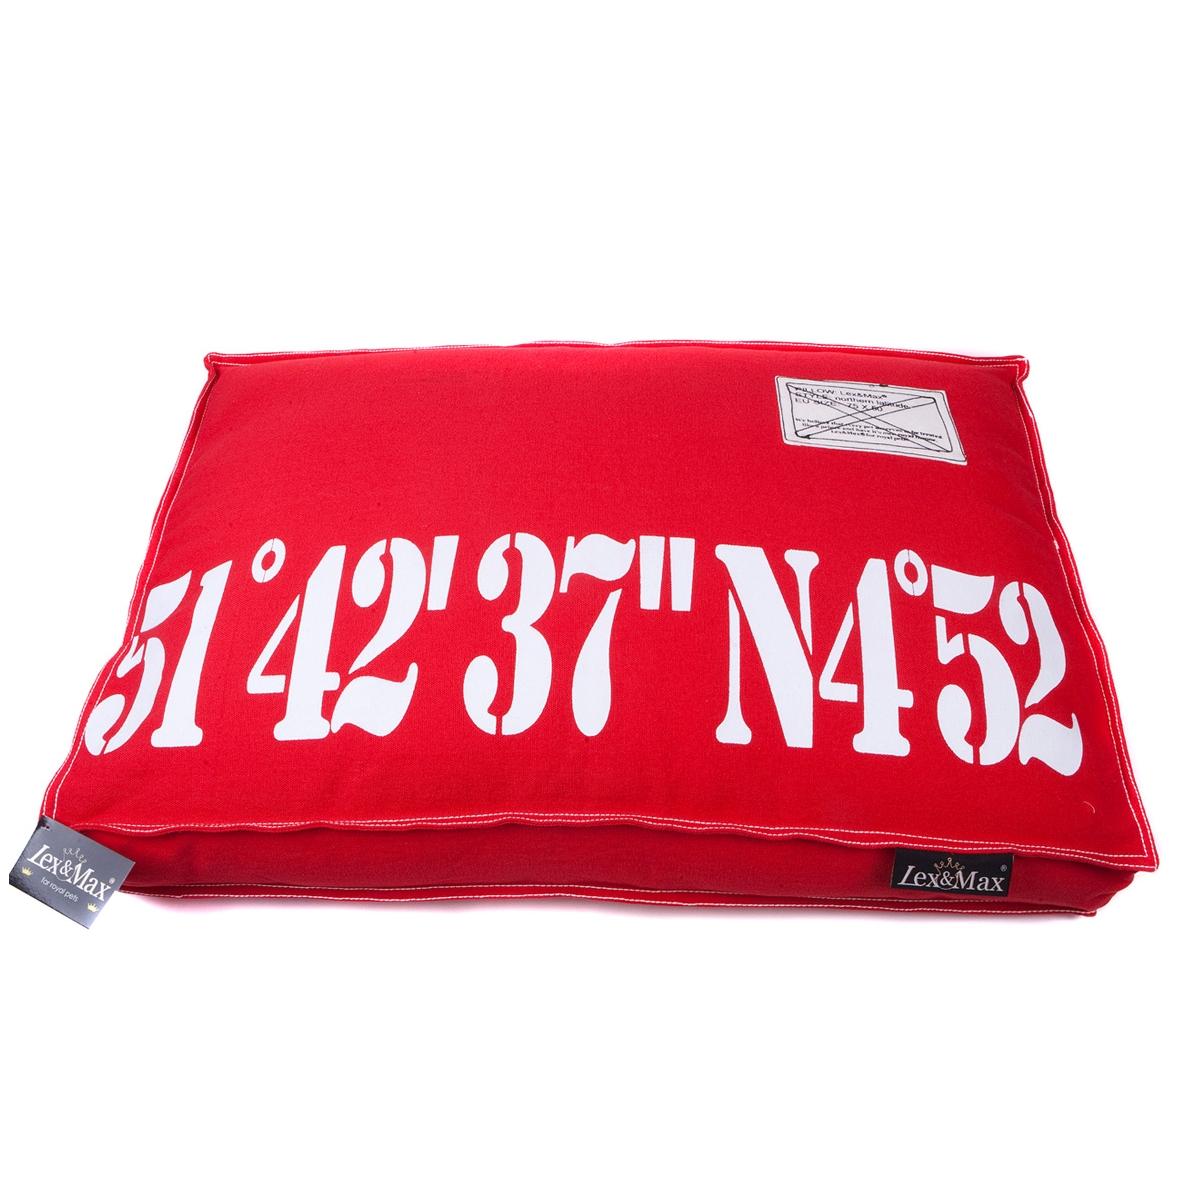 Productafbeelding voor 'Boxbed 51-42 rood'